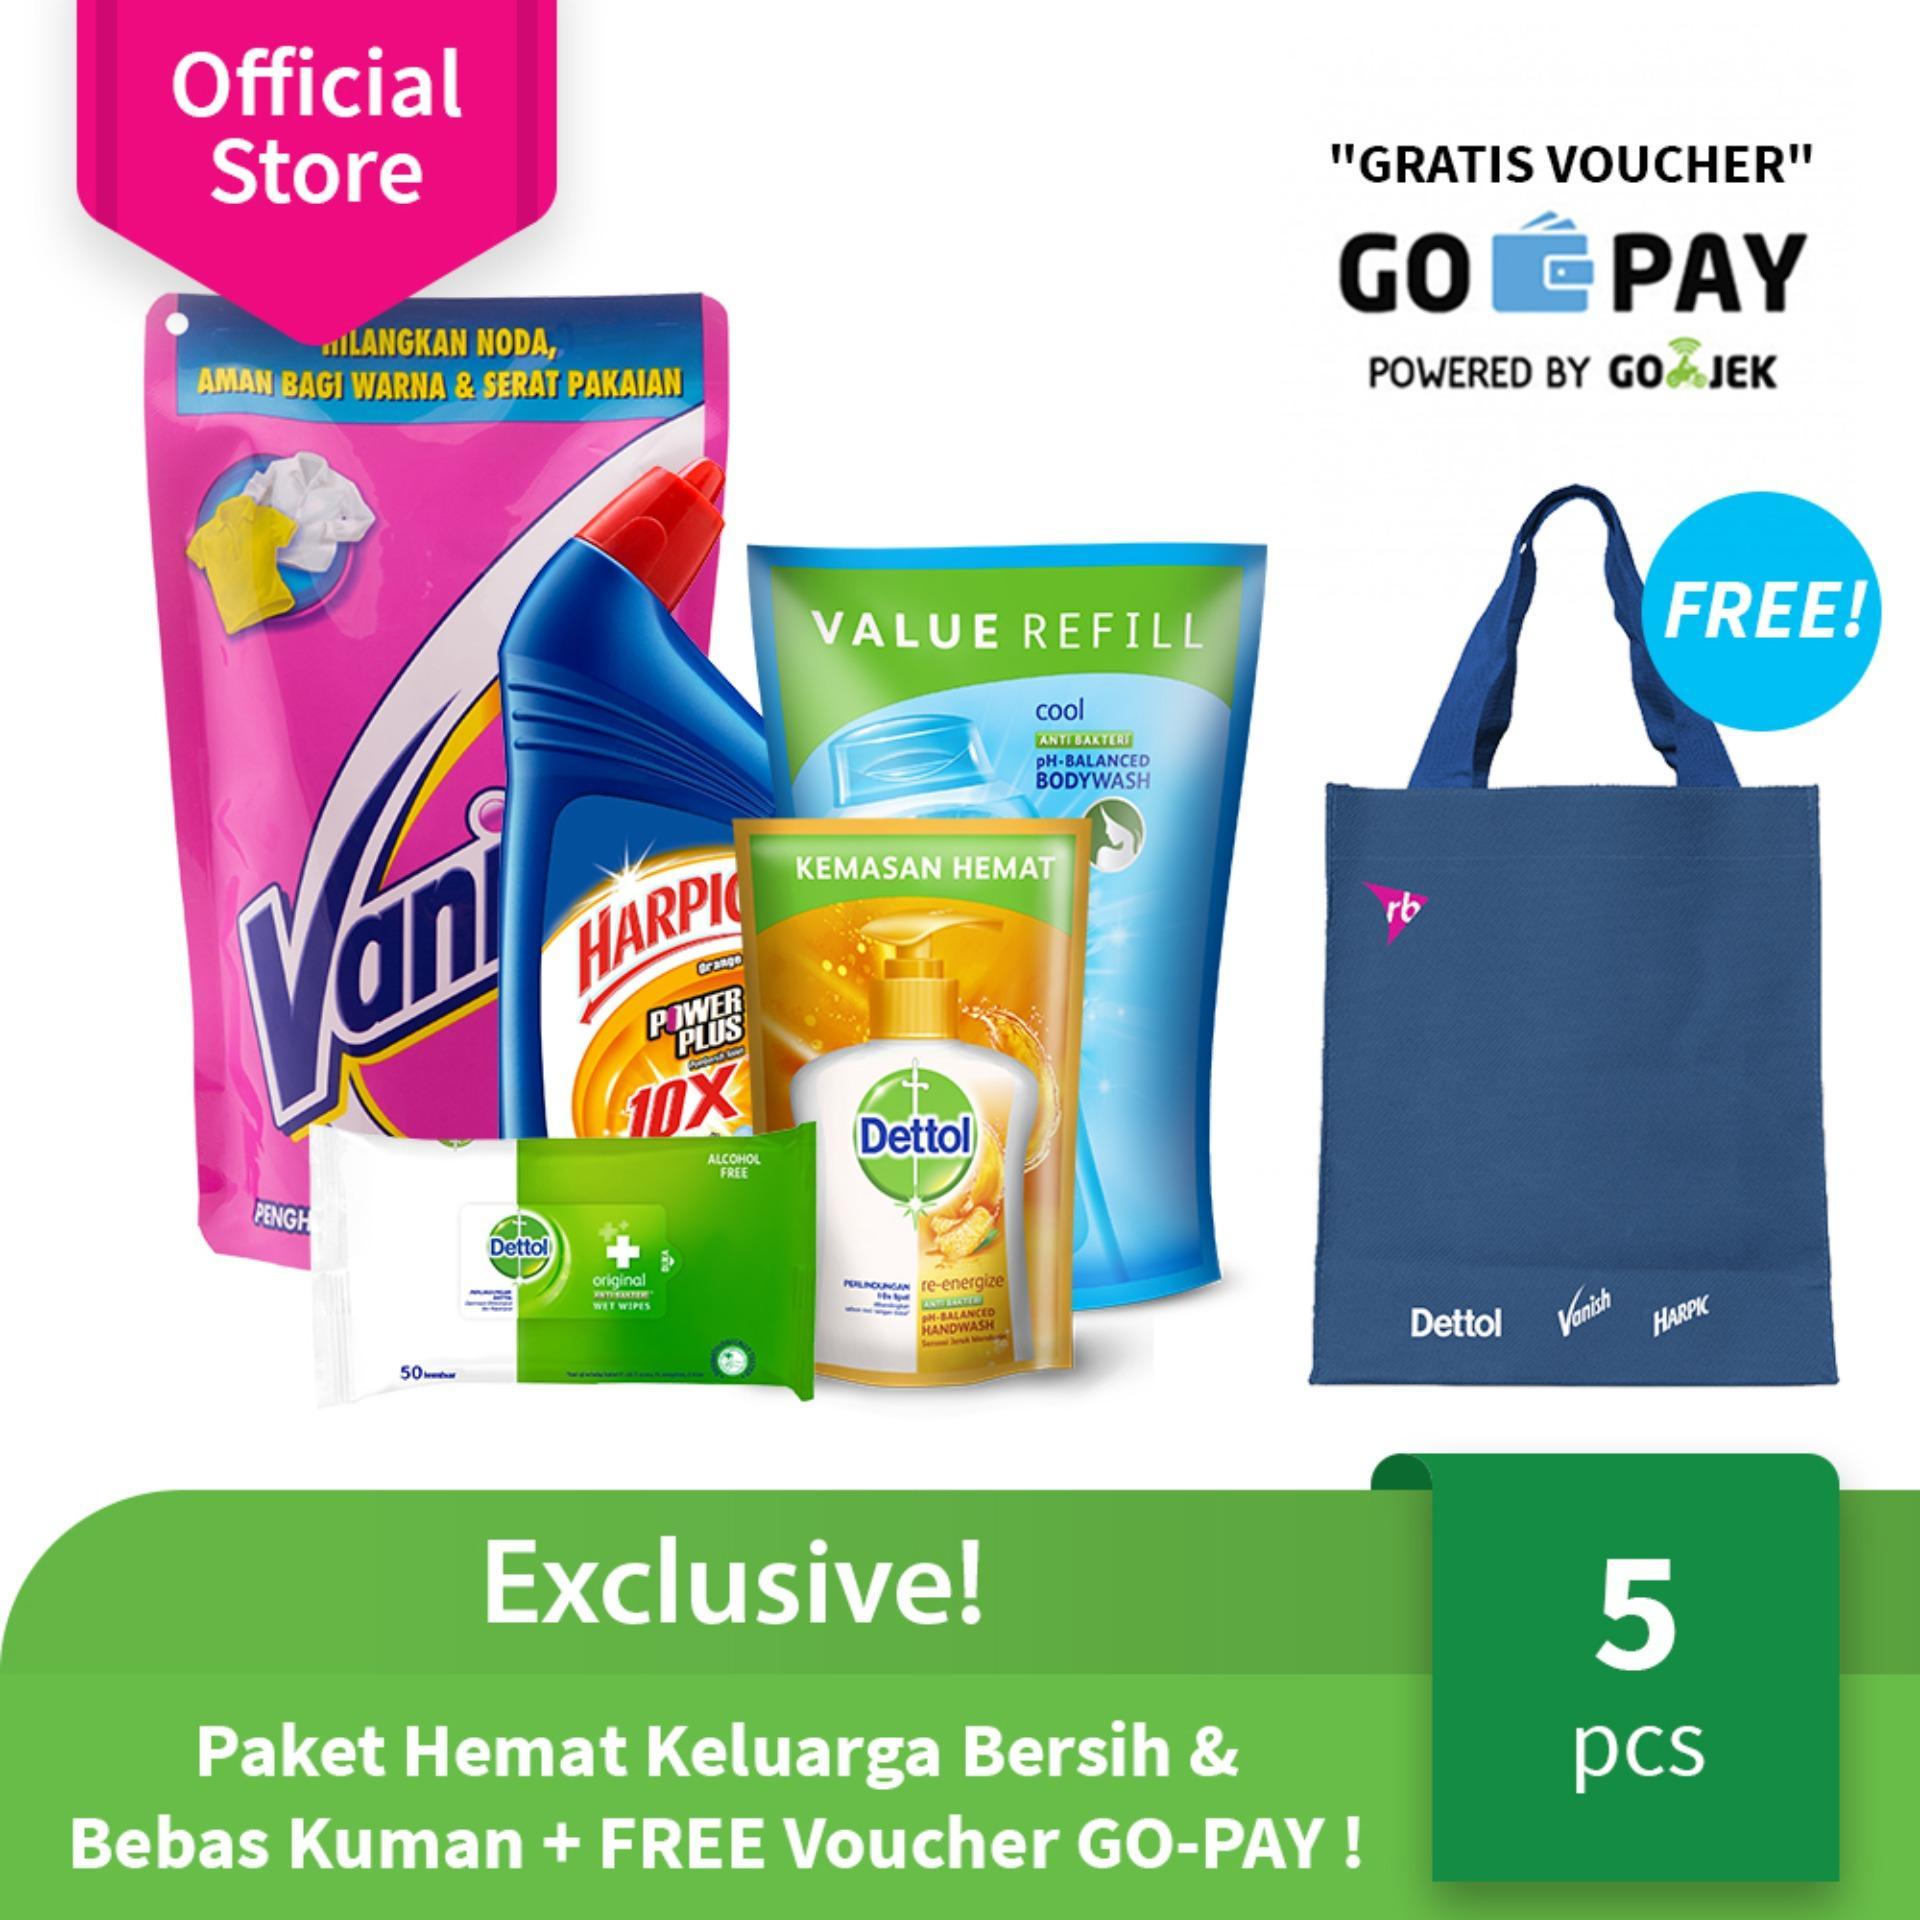 Exclusive! Paket Hemat Keluarga Bersih & Bebas Kuman + FREE Voucher GO-PAY ! (A)